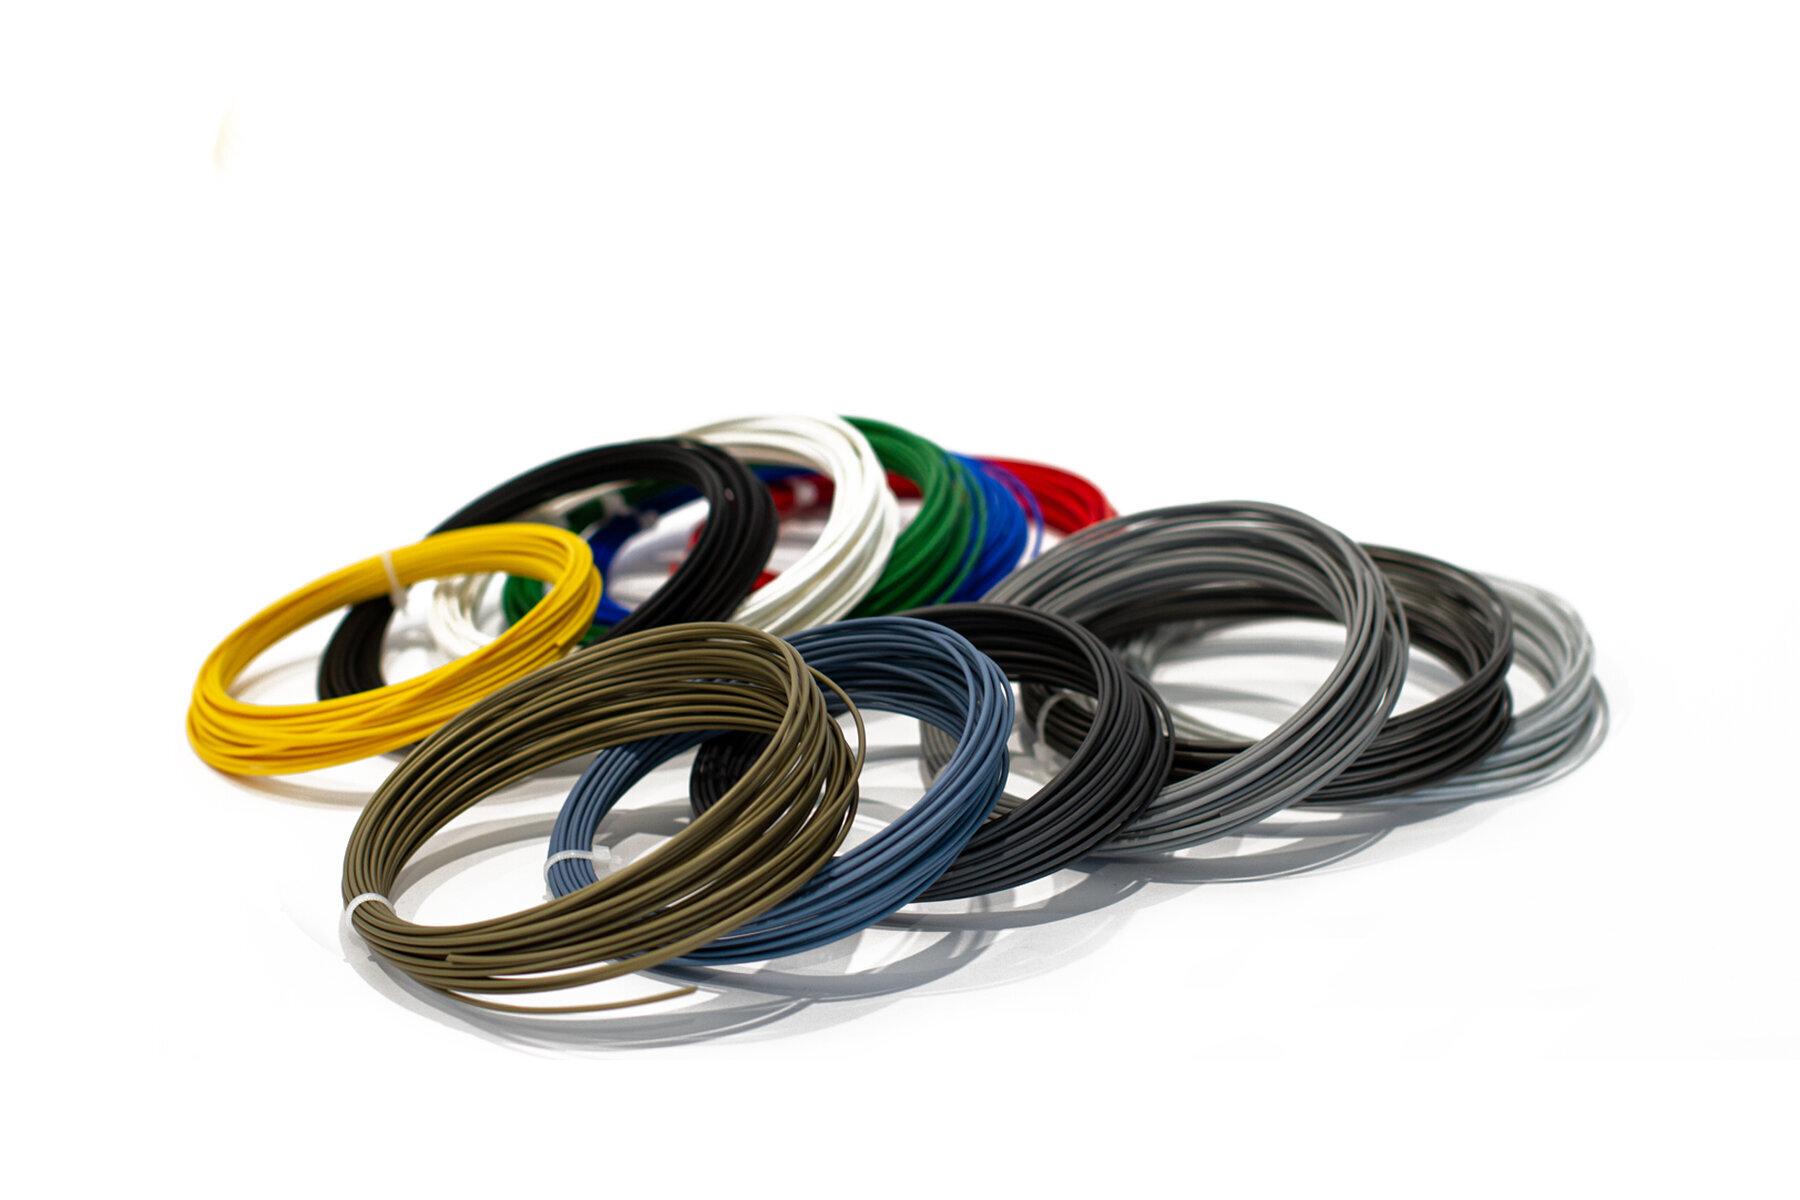 Filalab PLA filamentų rinkinys 3D pieštukams, 12 spalvų